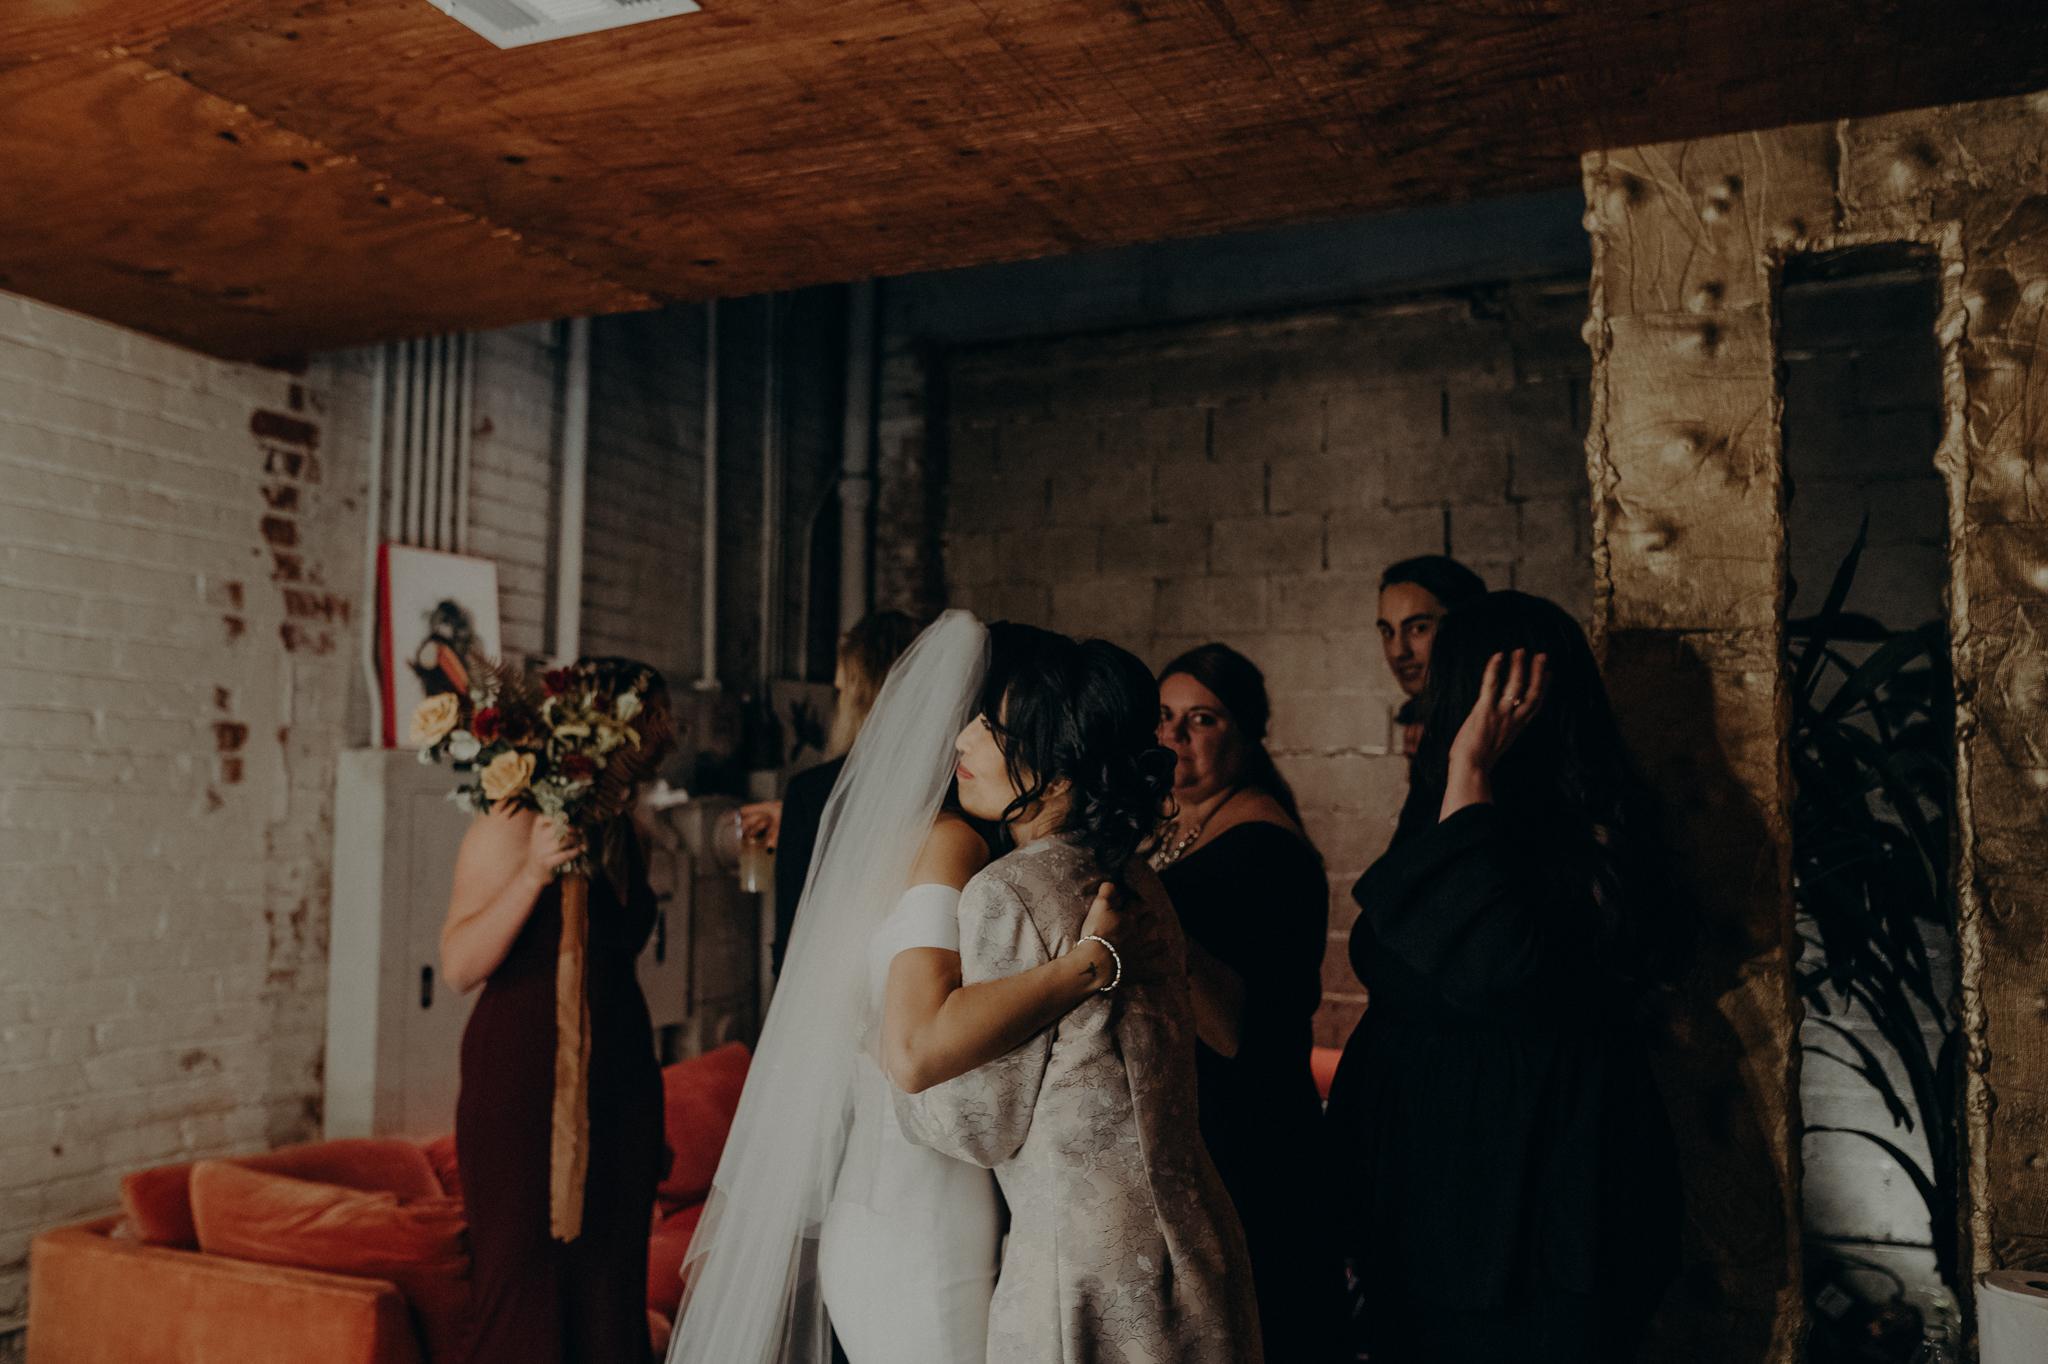 Wedding Photo LA - wedding photographer in los angeles - millwick wedding venue -isaiahandtaylor.com-105.jpg